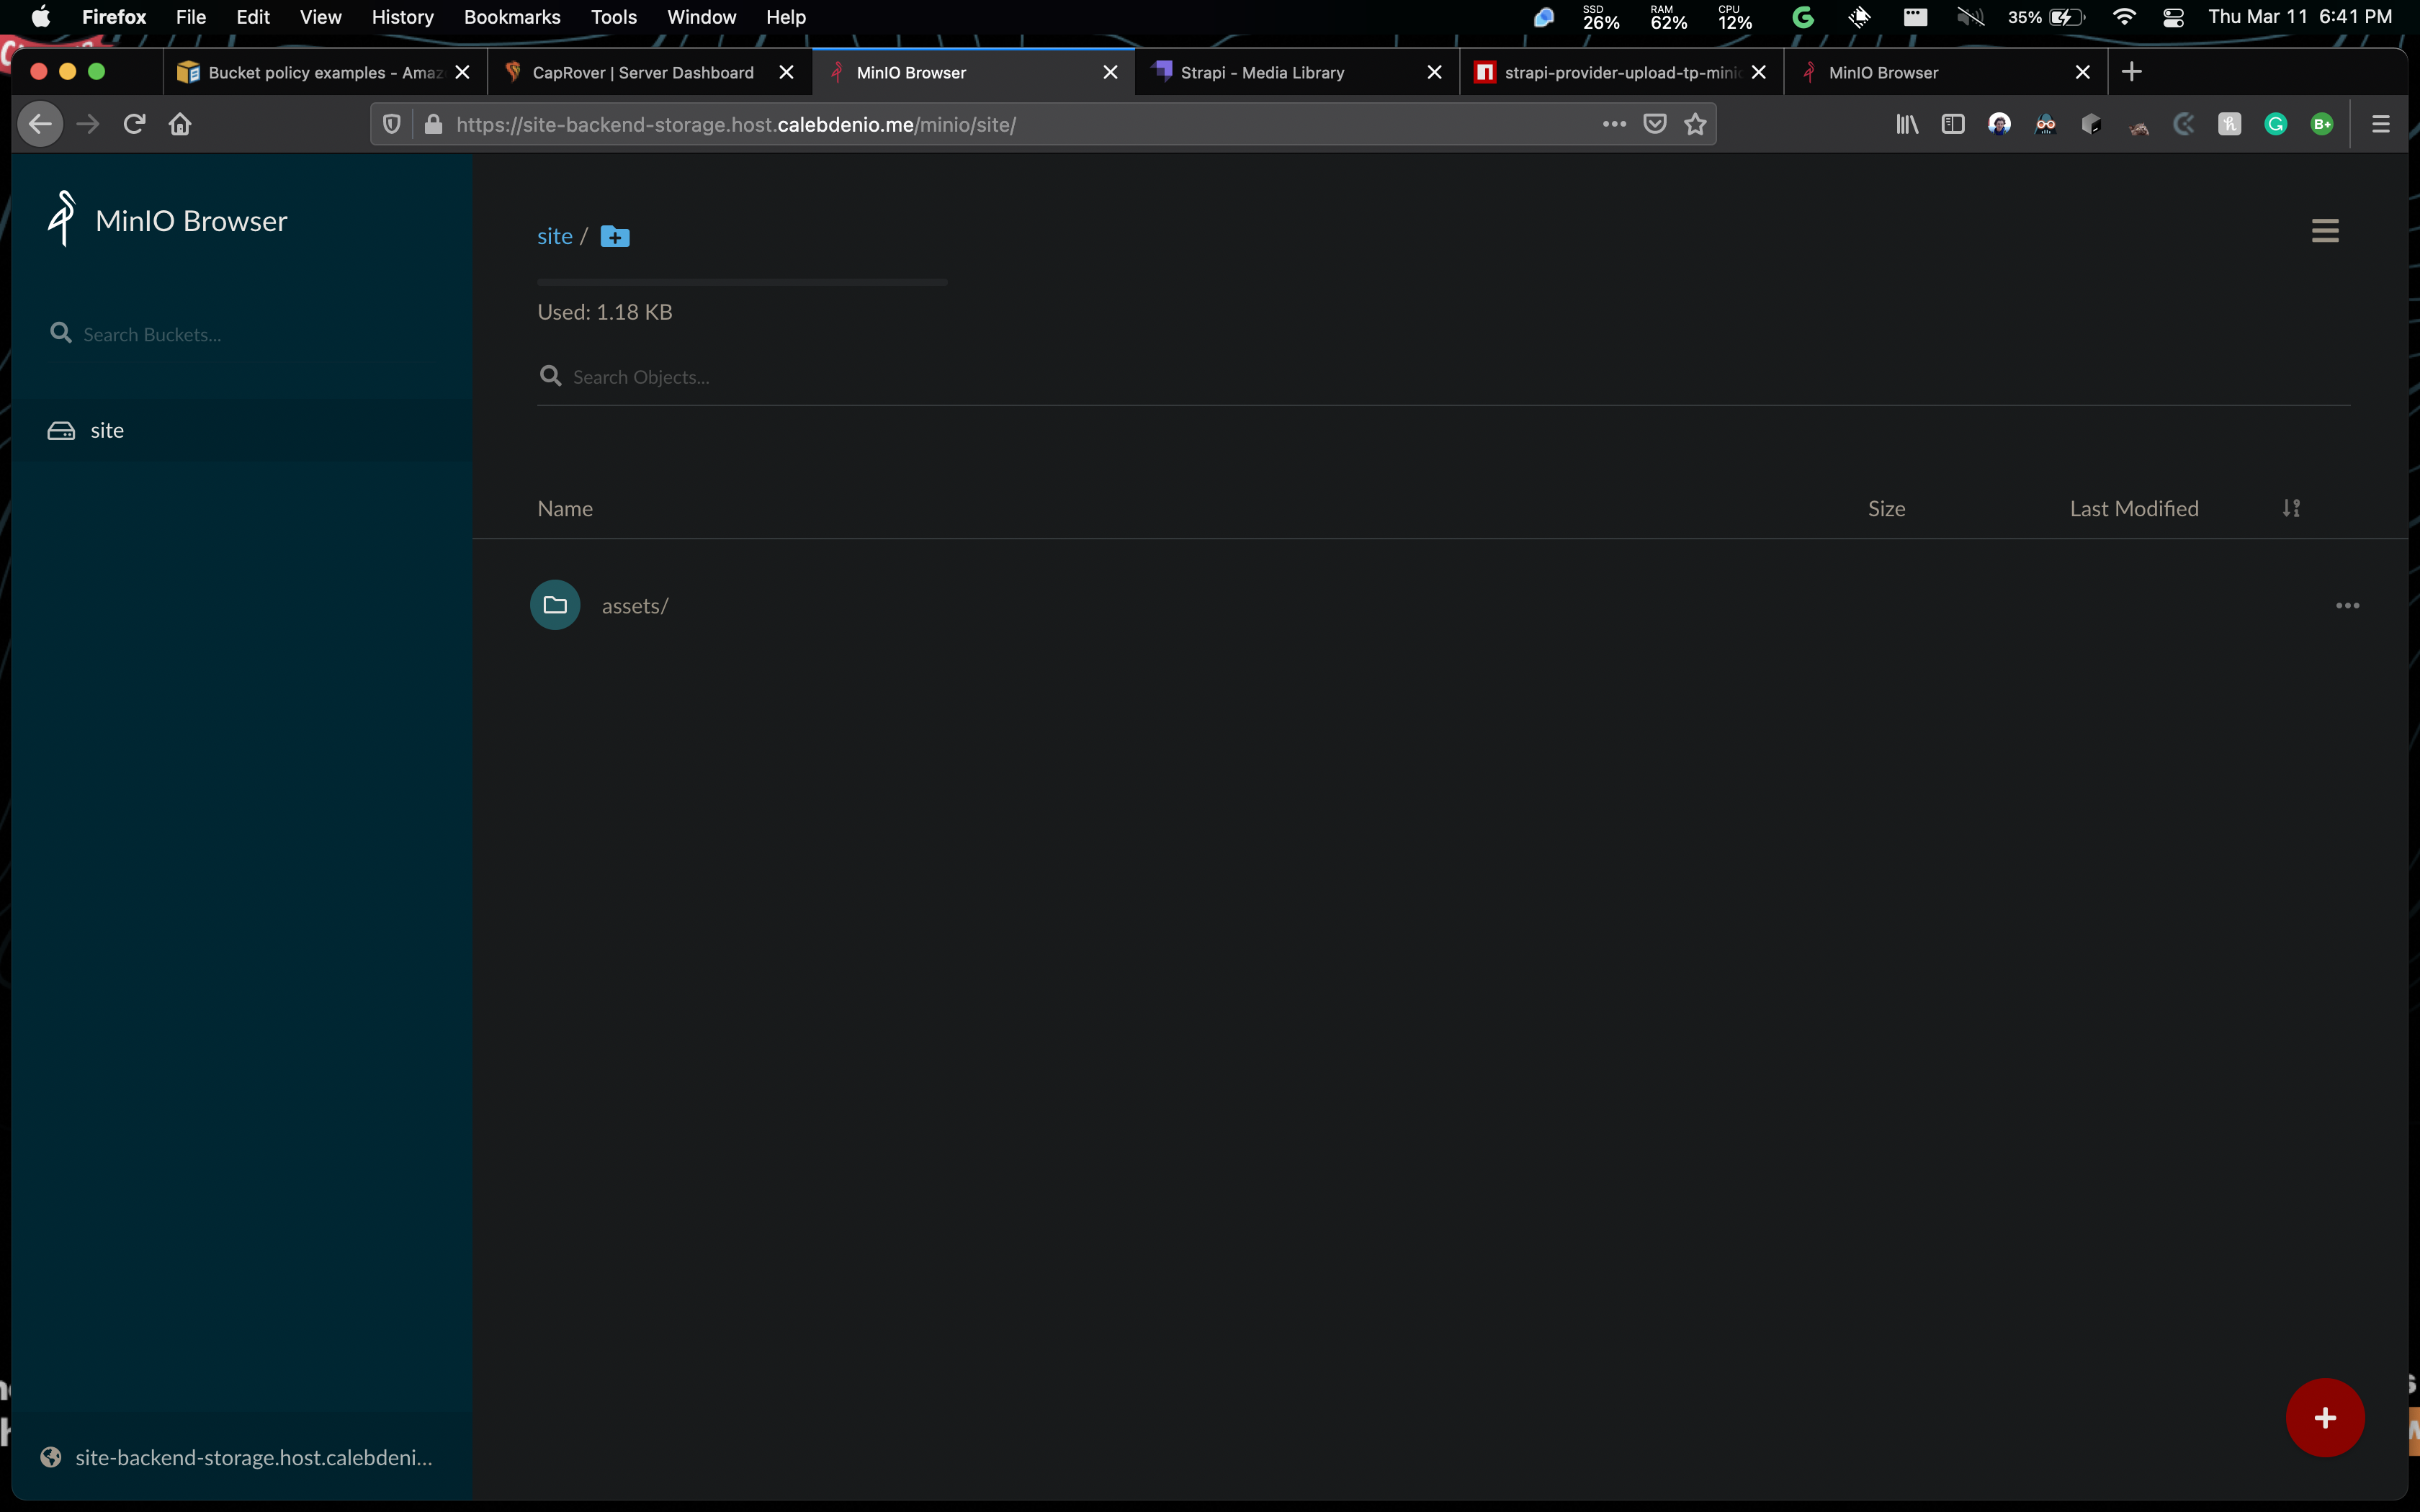 https://cloud-r3t3plpgo-hack-club-bot.vercel.app/0screen_shot_2021-03-11_at_6.41.25_pm.png